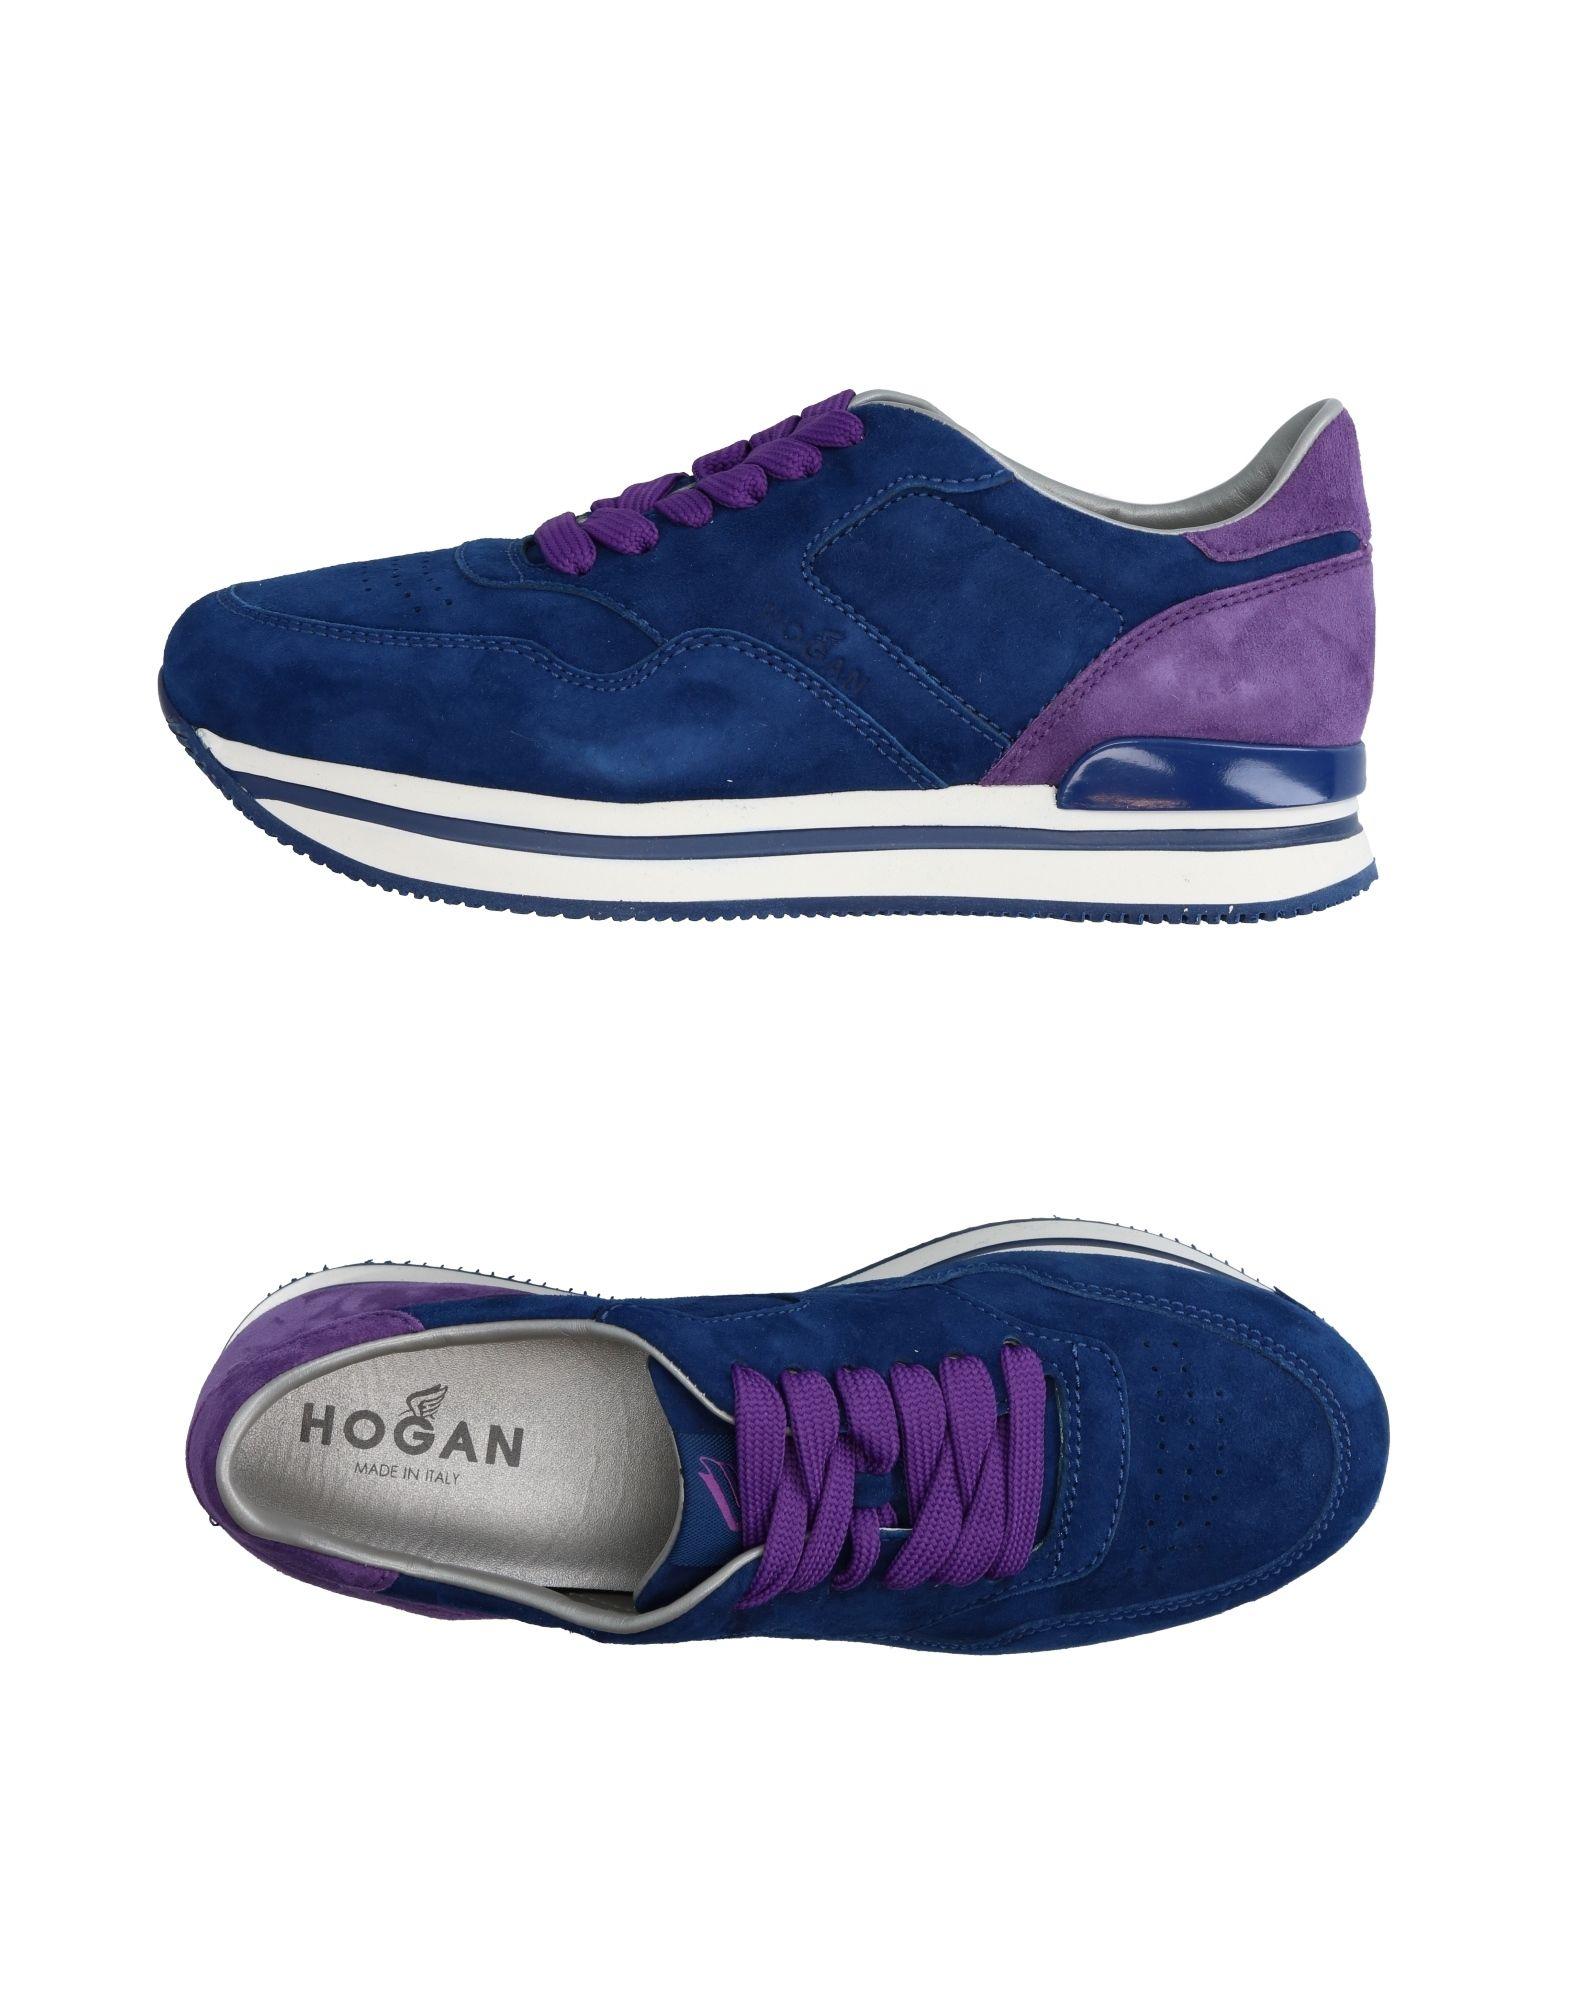 HOGAN Damen Low Sneakers & Tennisschuhe Farbe Blau Größe 6